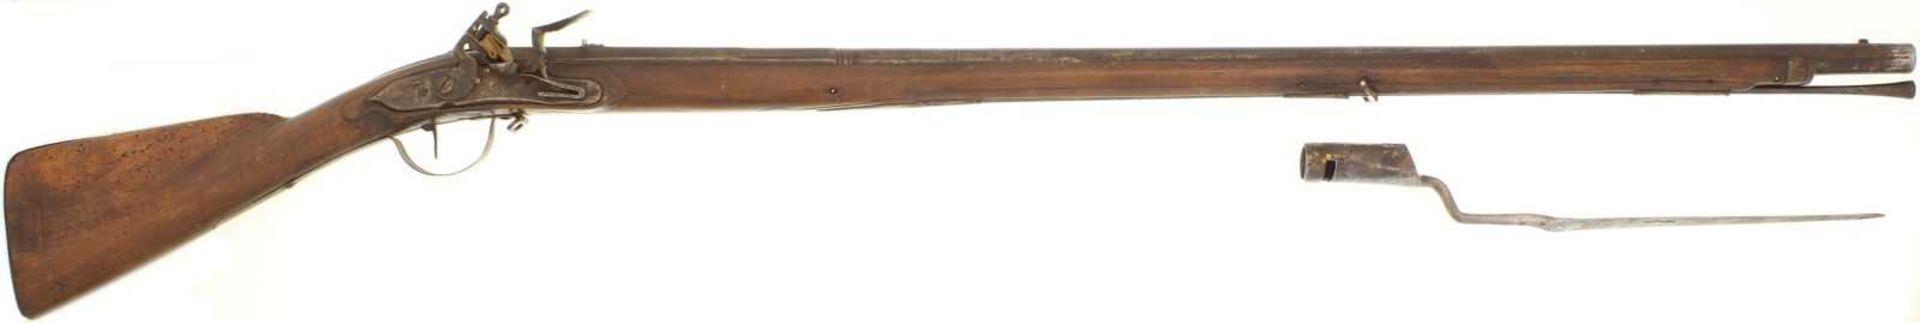 Steinschlossgewehr, Preussen? kant. Ord. um 1720, Kal. 19.5mm LL 1080mm, TL 1440mm, Rundlauf,